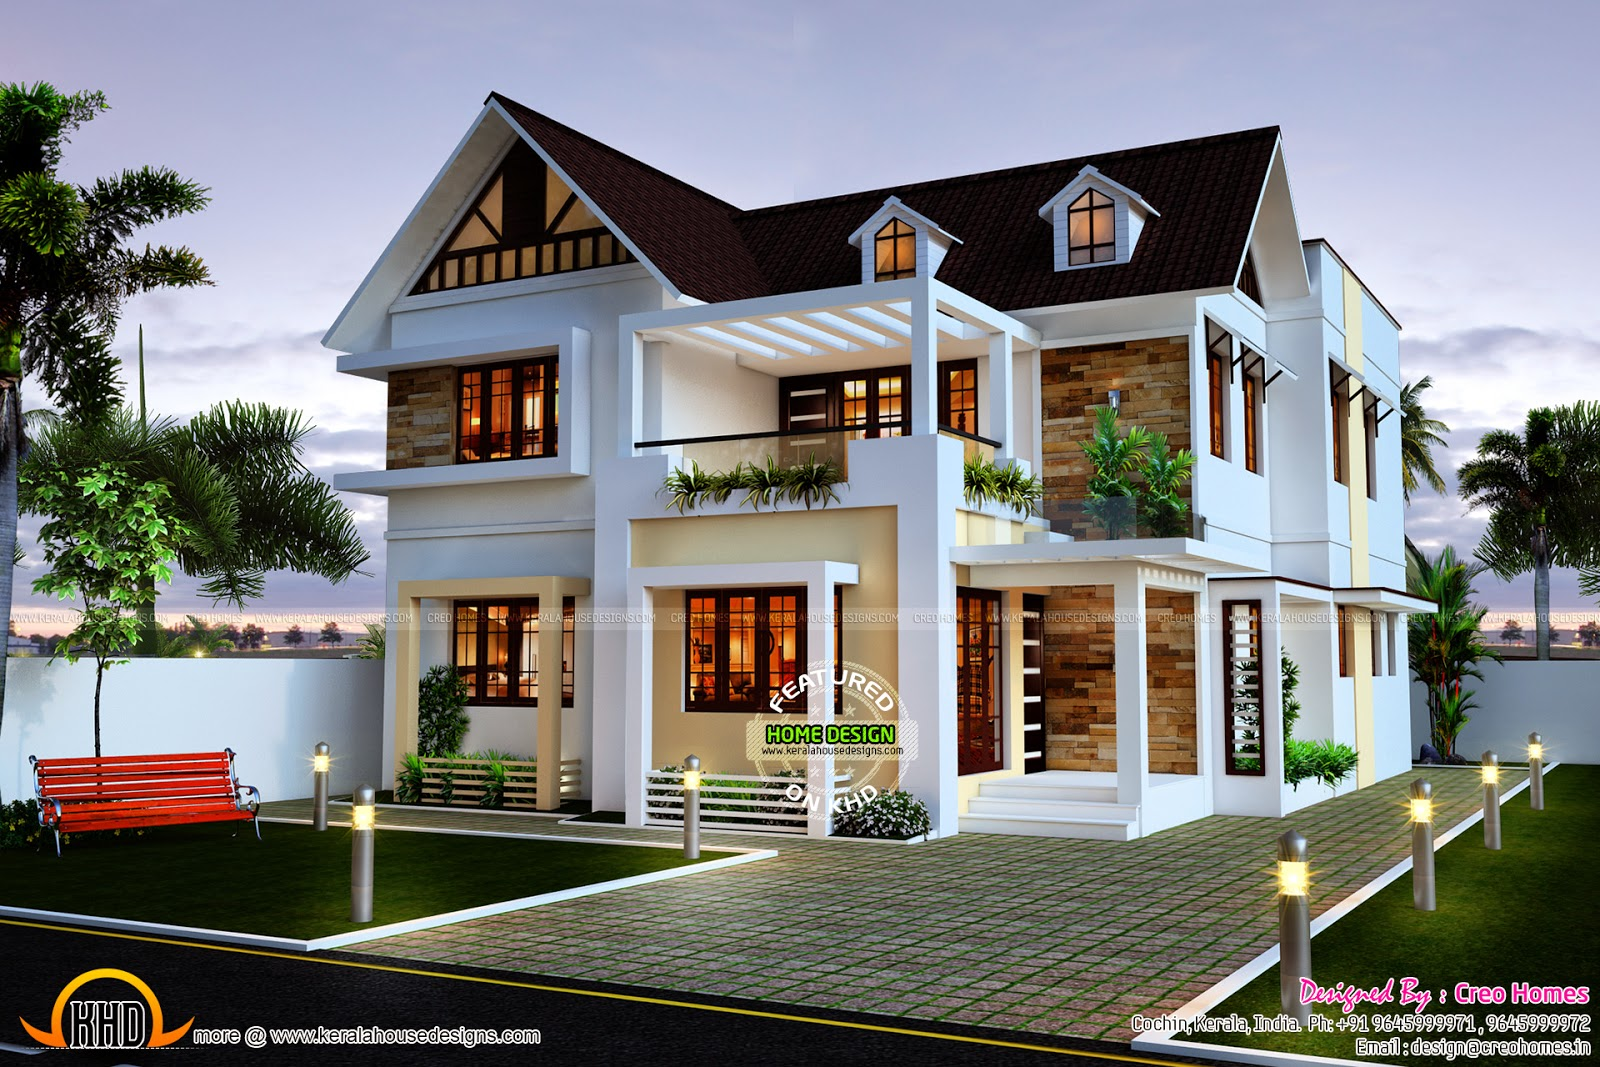 house plans single story house floor plans sf ranch sf house plans house plans home design ideas